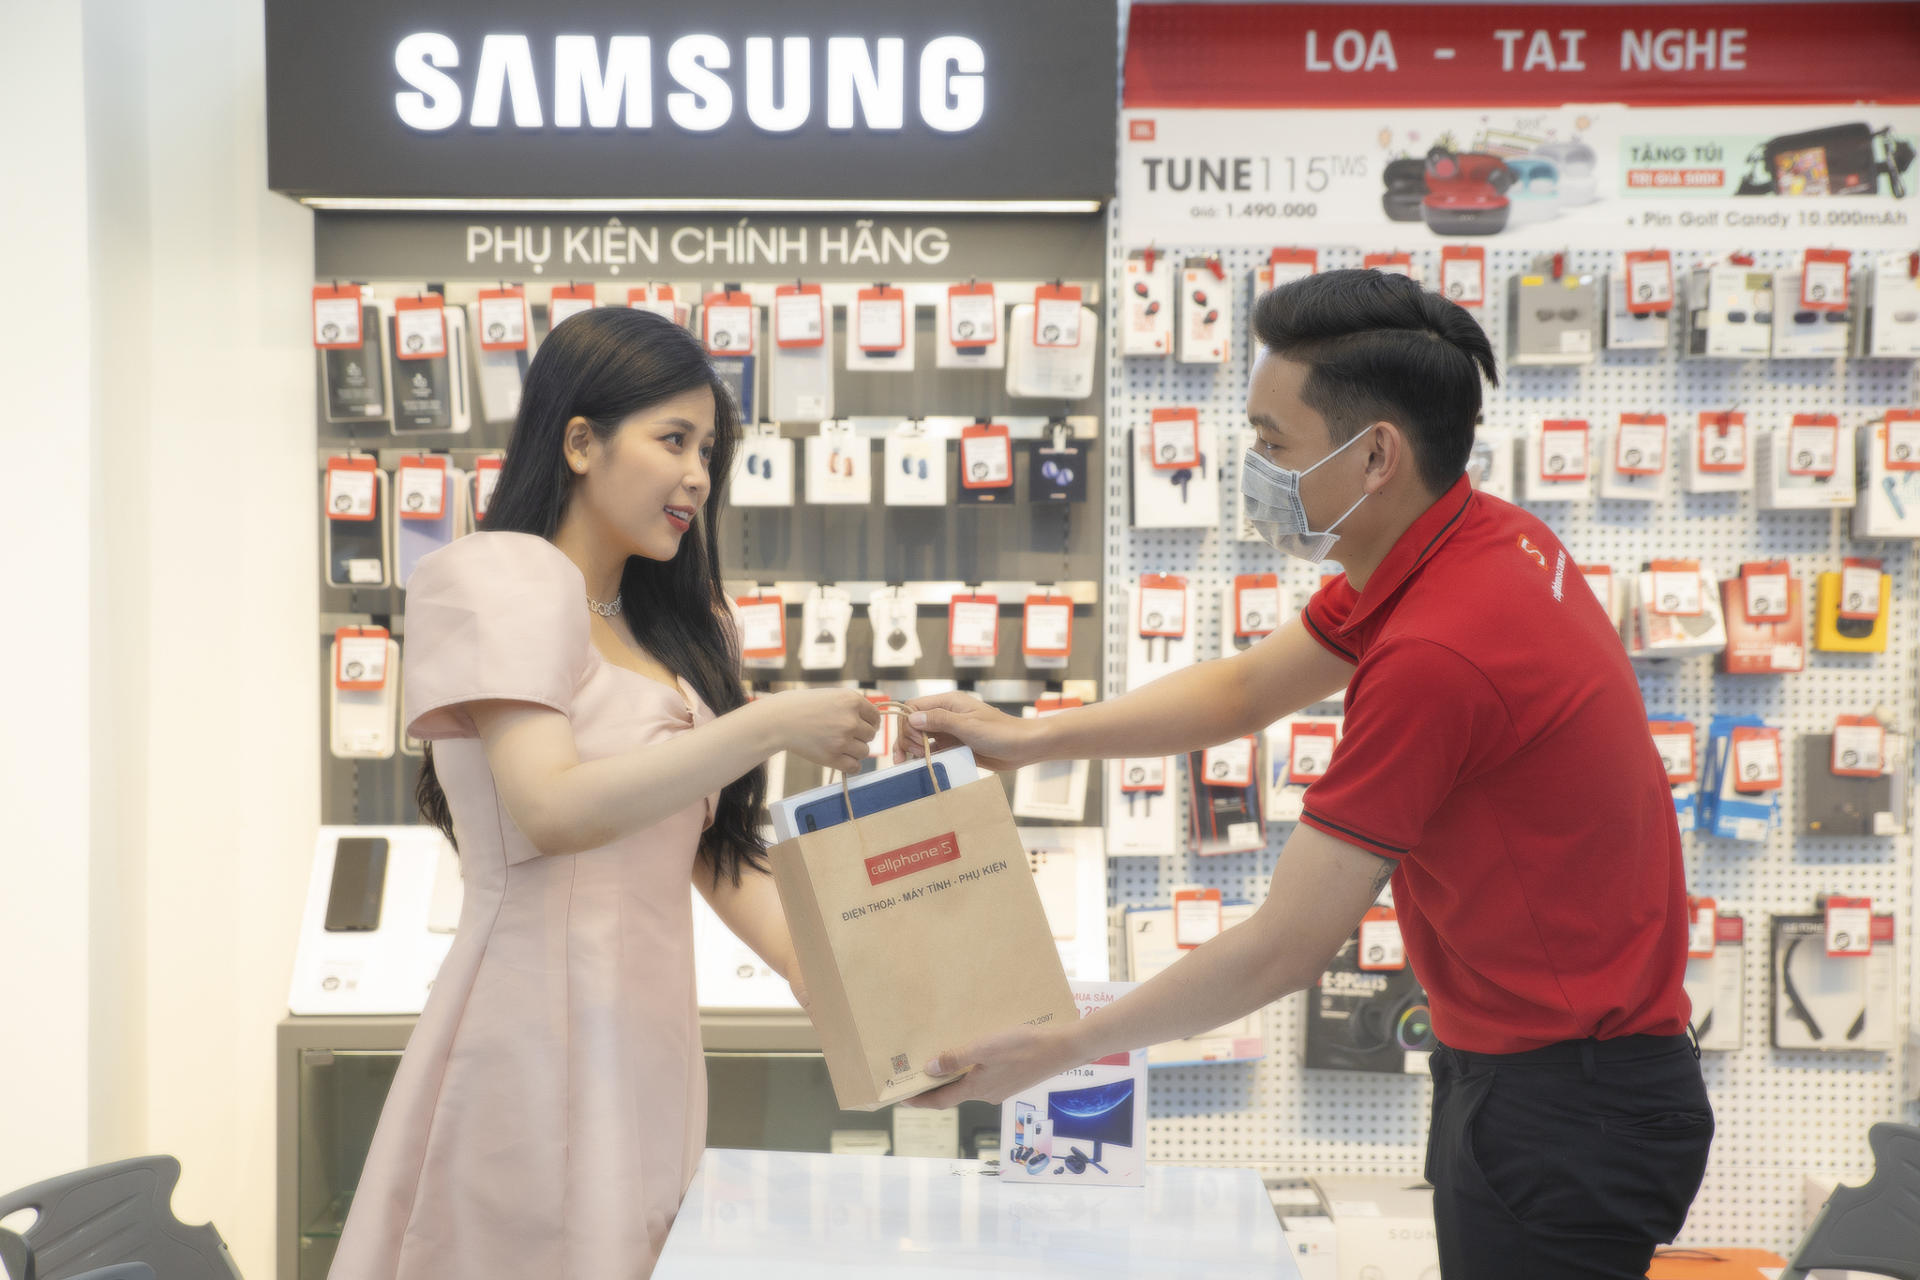 CellphoneS sale 'khủng' mừng lễ lớn